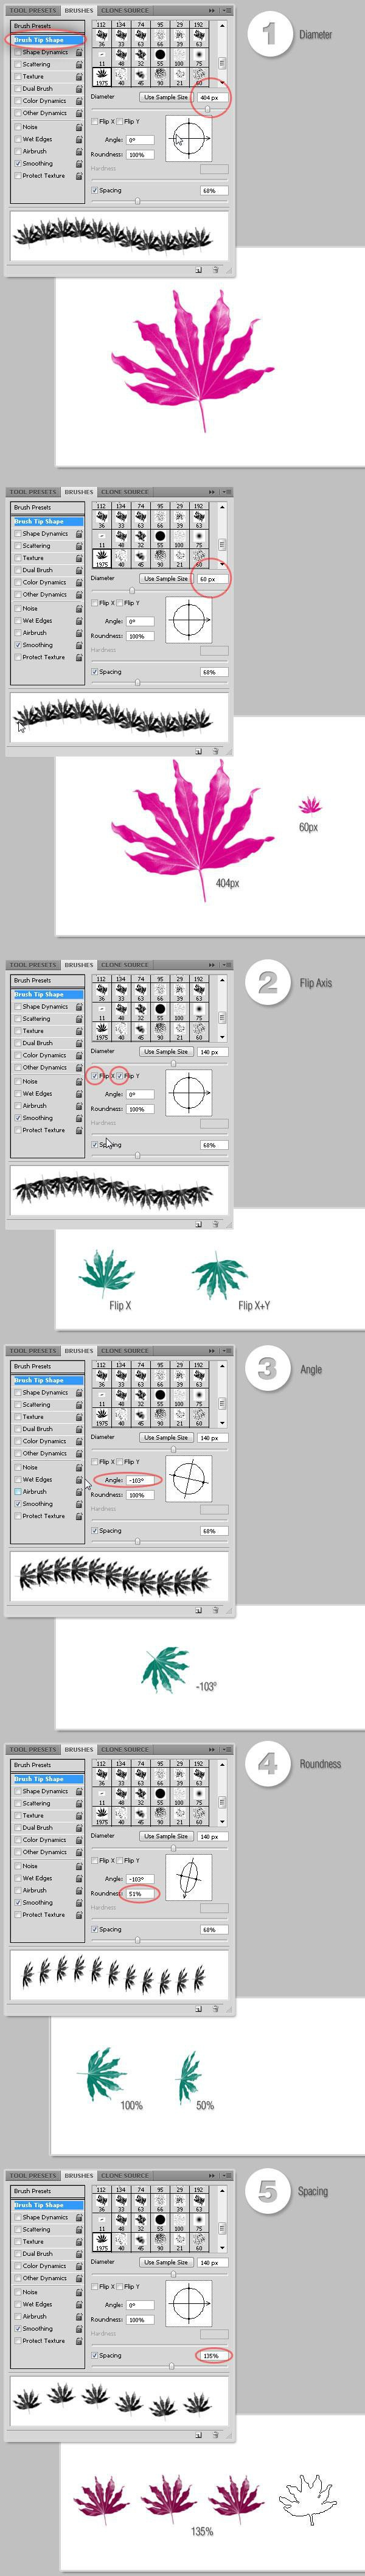 Photoshops Brush Guide For Beginners